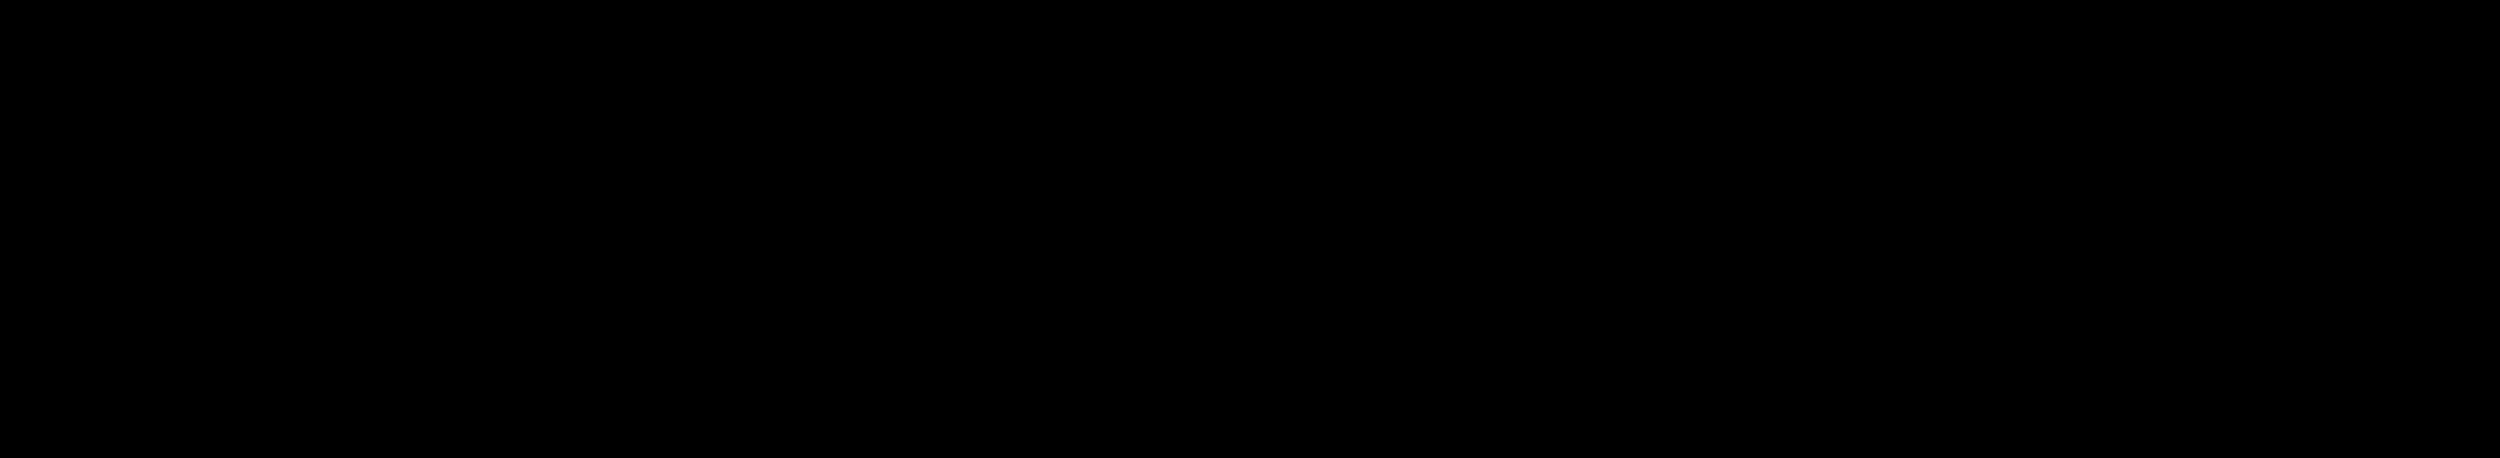 Menicon lenzenvloeistof